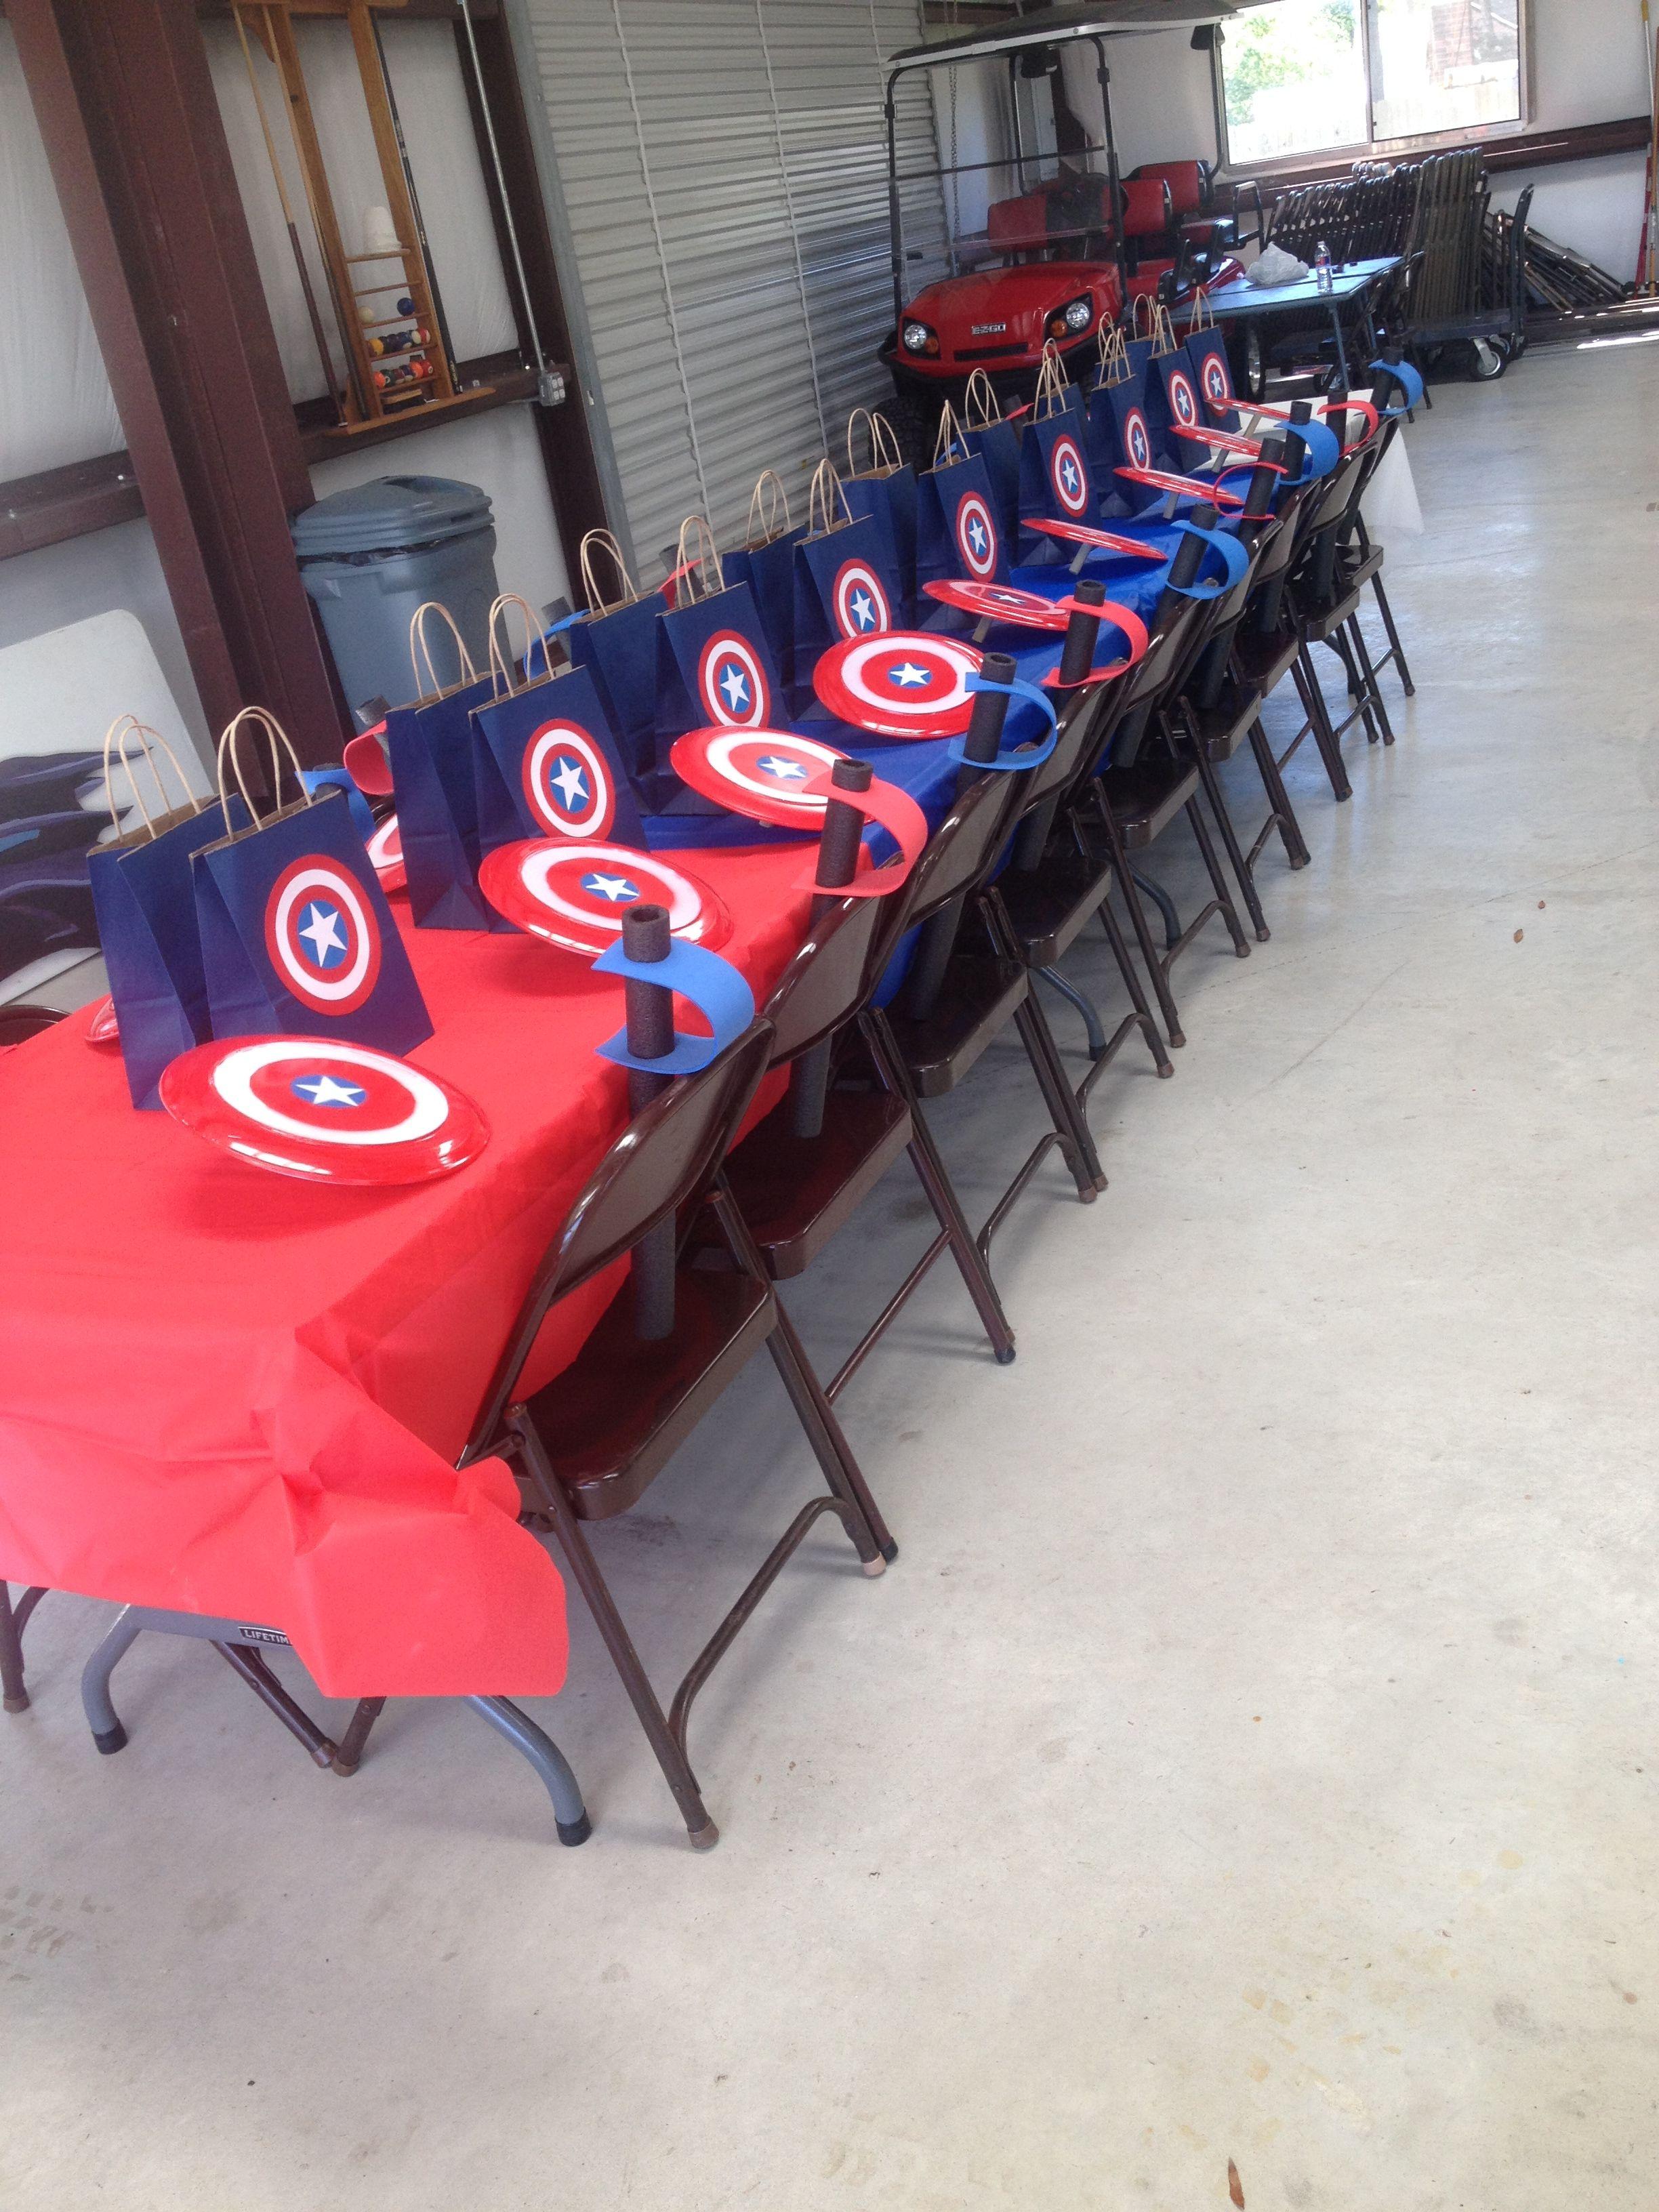 captain america table and chair set 1 21 sayedbrothers nl u2022 rh 1 21 sayedbrothers nl